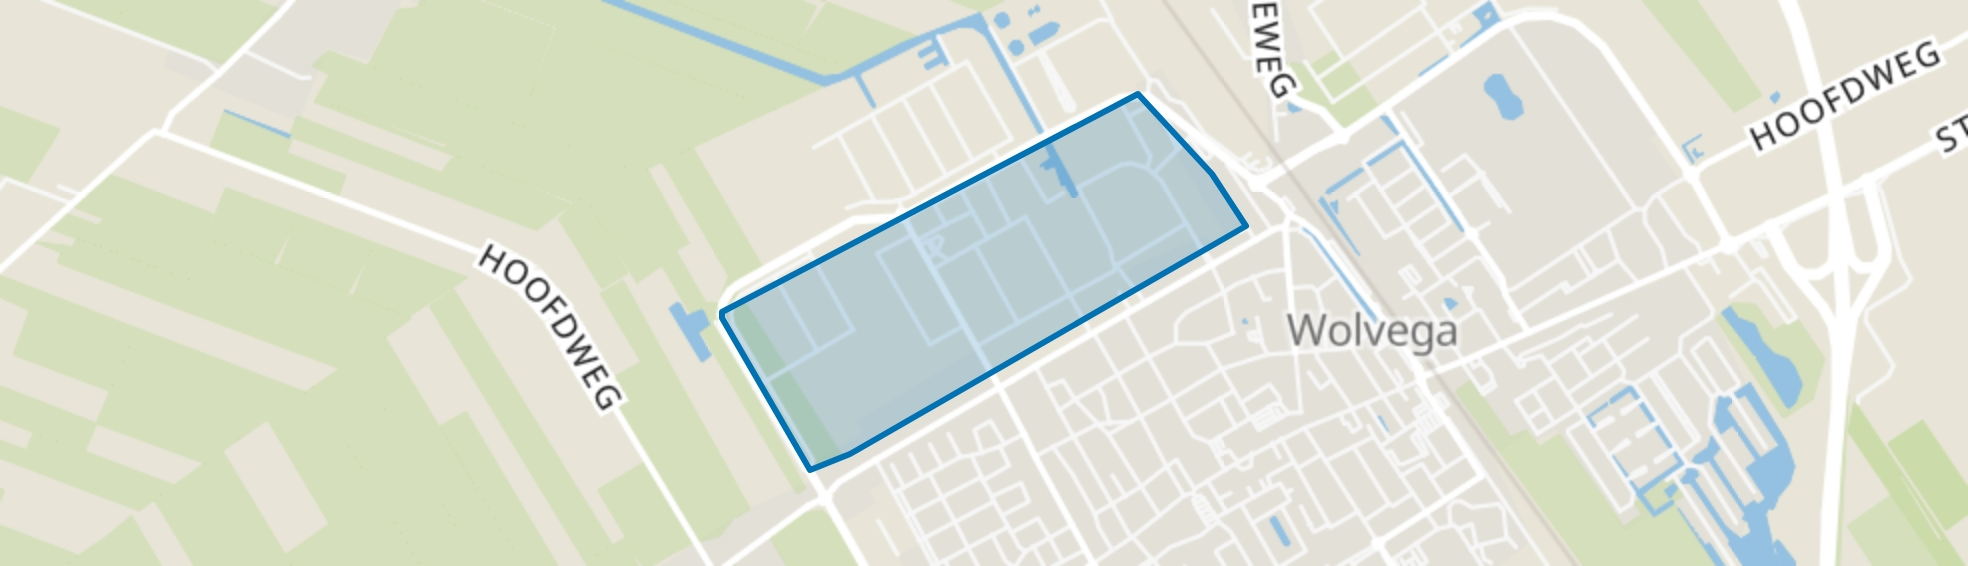 Wolvega-Om de Noort, Wolvega map